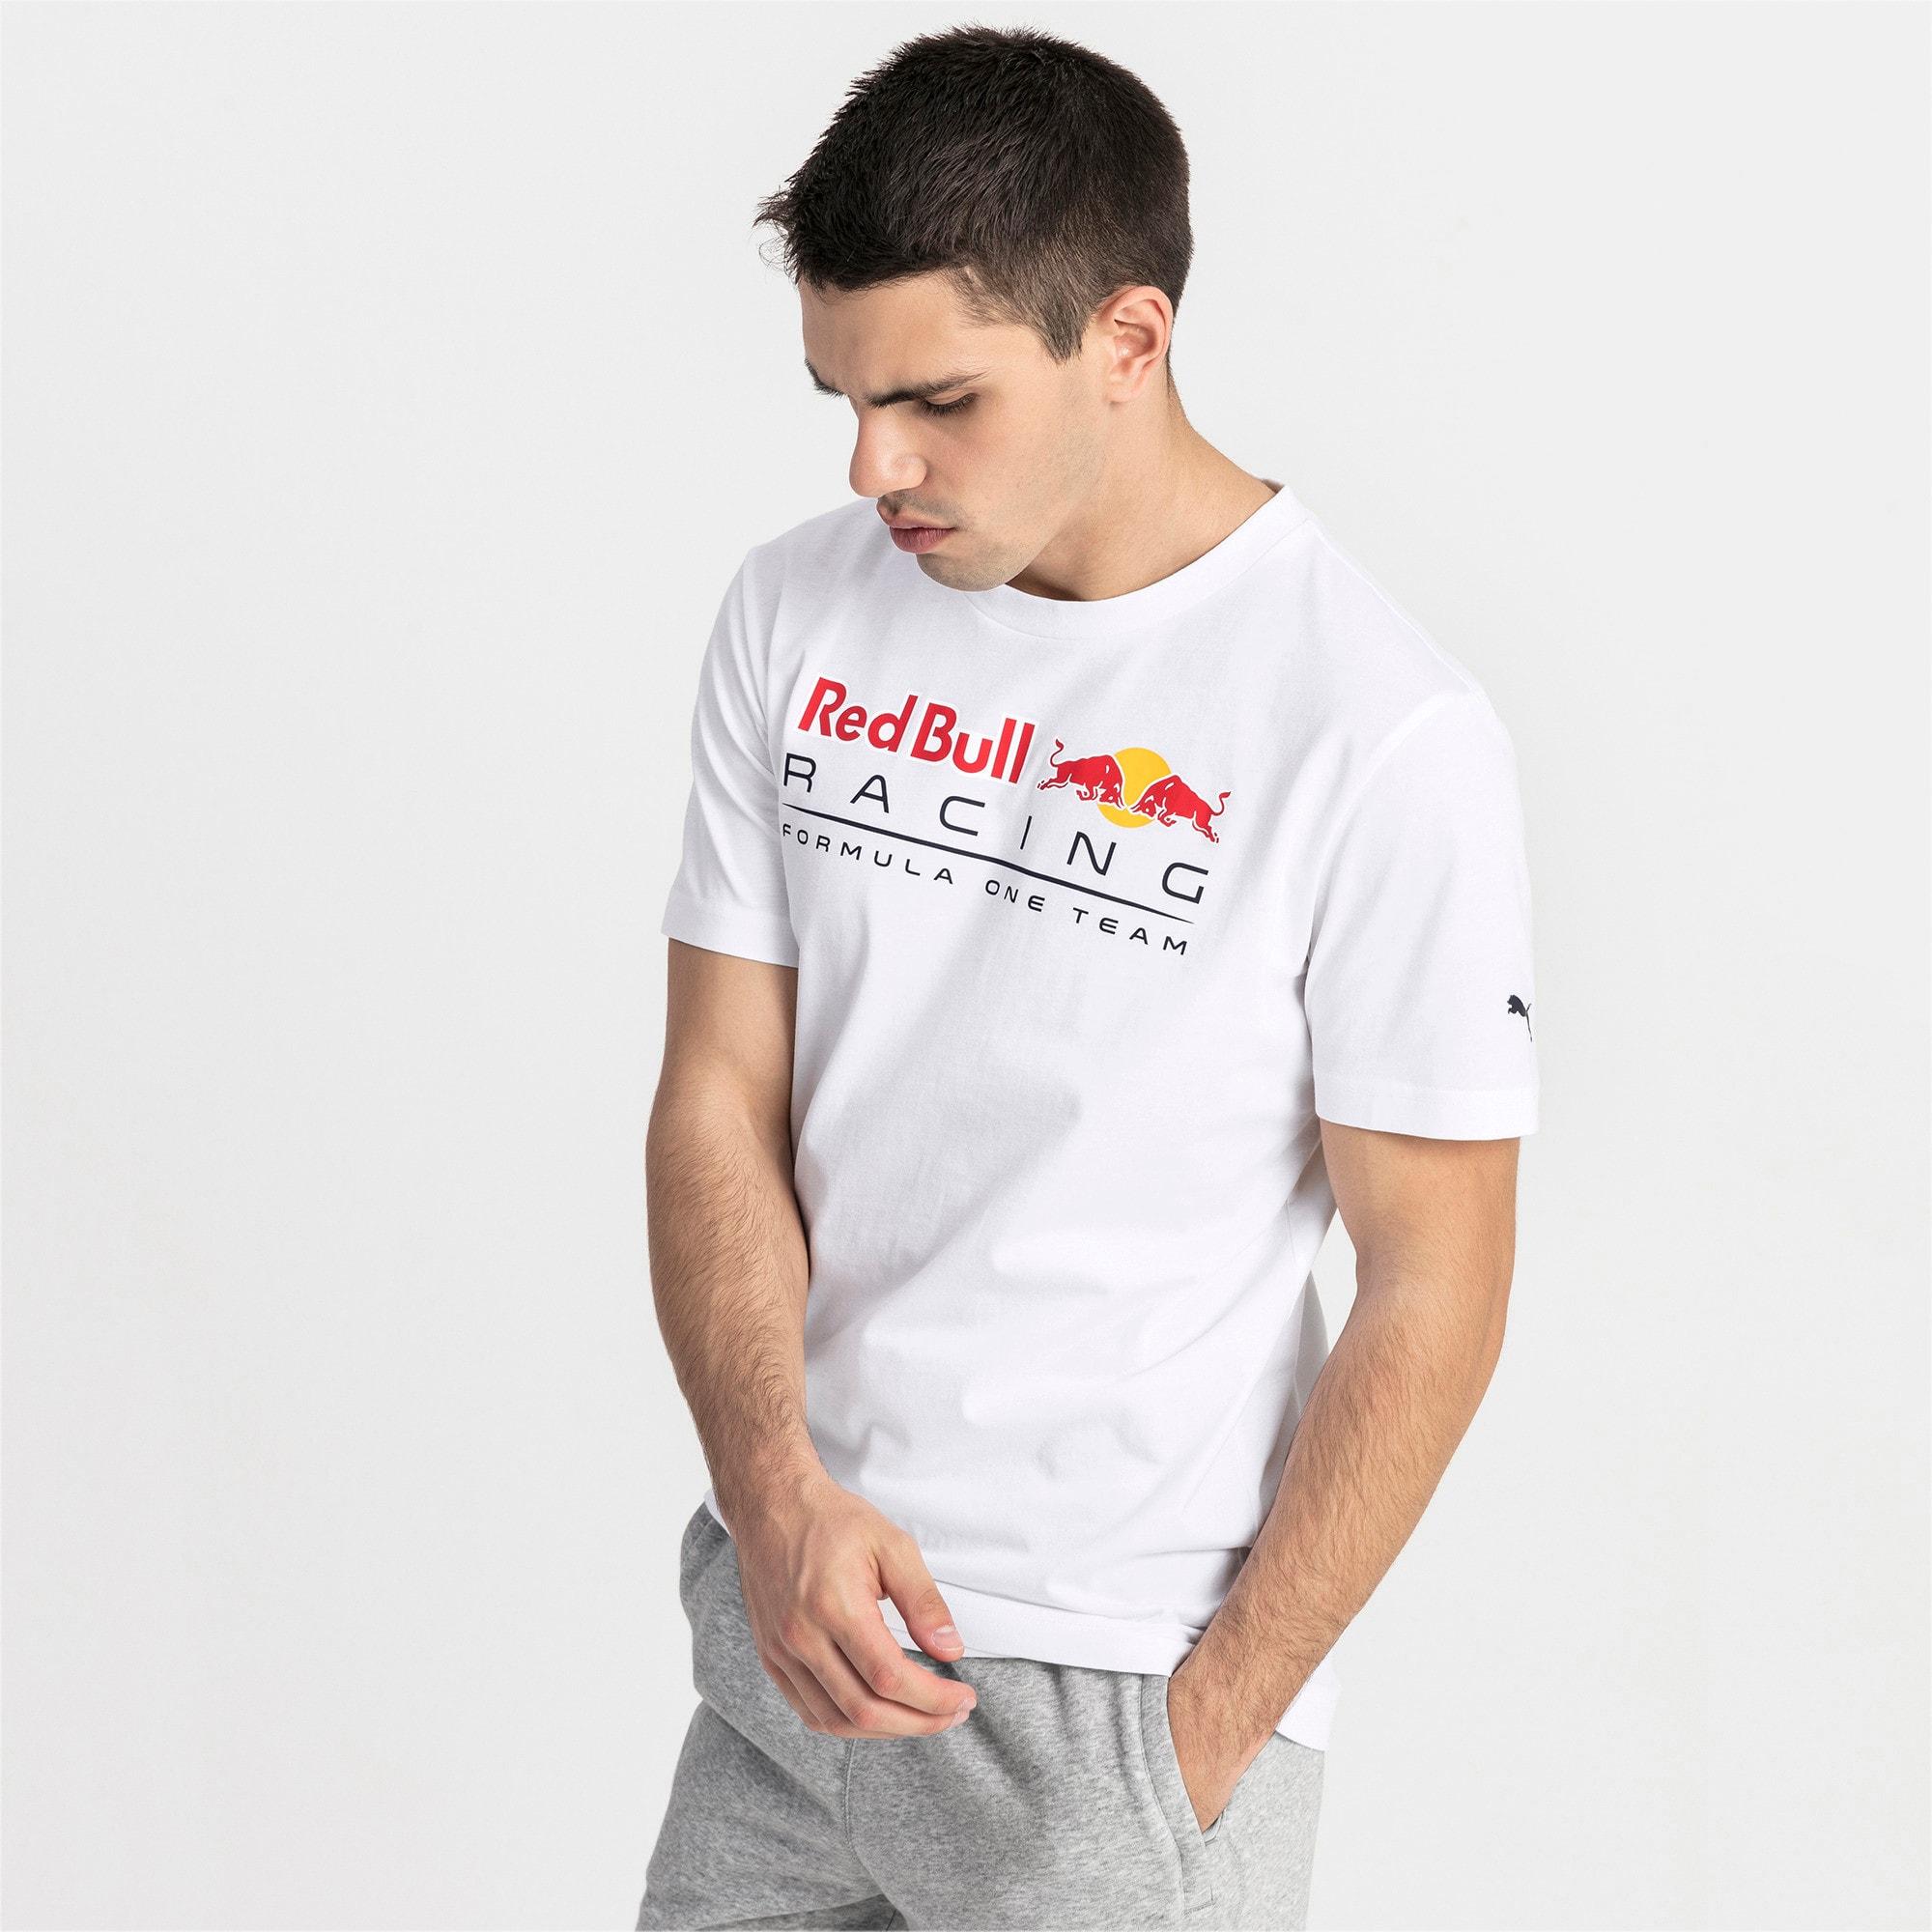 Thumbnail 1 of Red Bull Racing logo-T-shirt voor heren, Puma White, medium